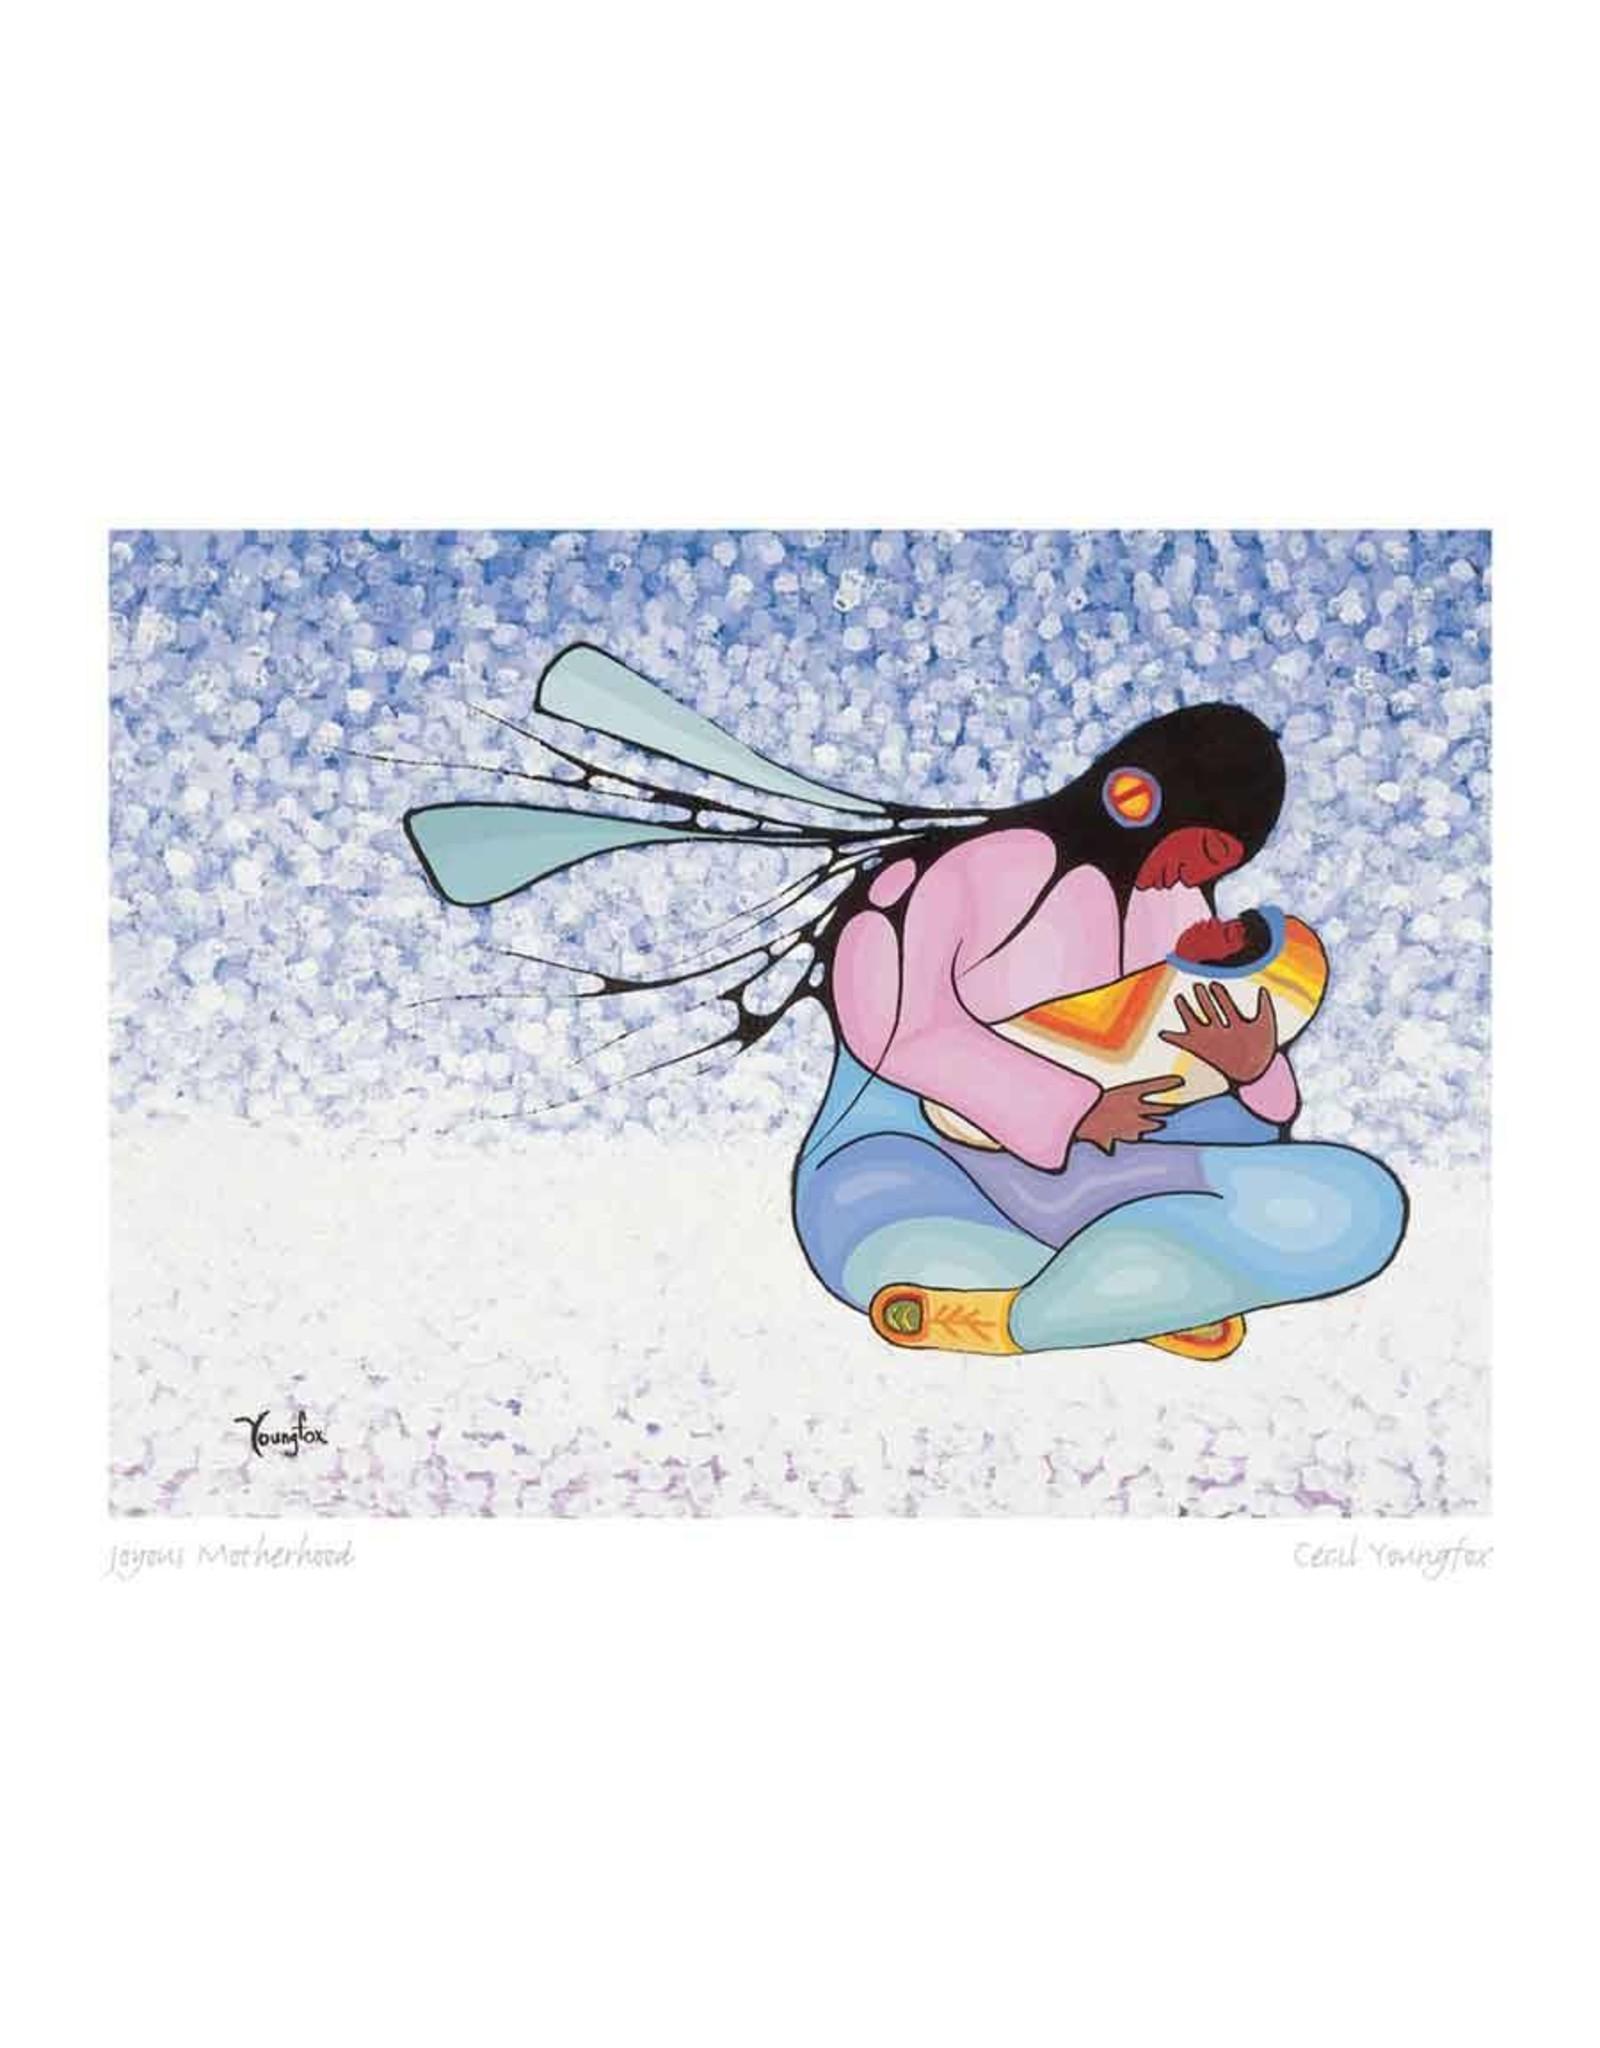 Joyous Motherhood by Cecil Youngfox Framed 3173